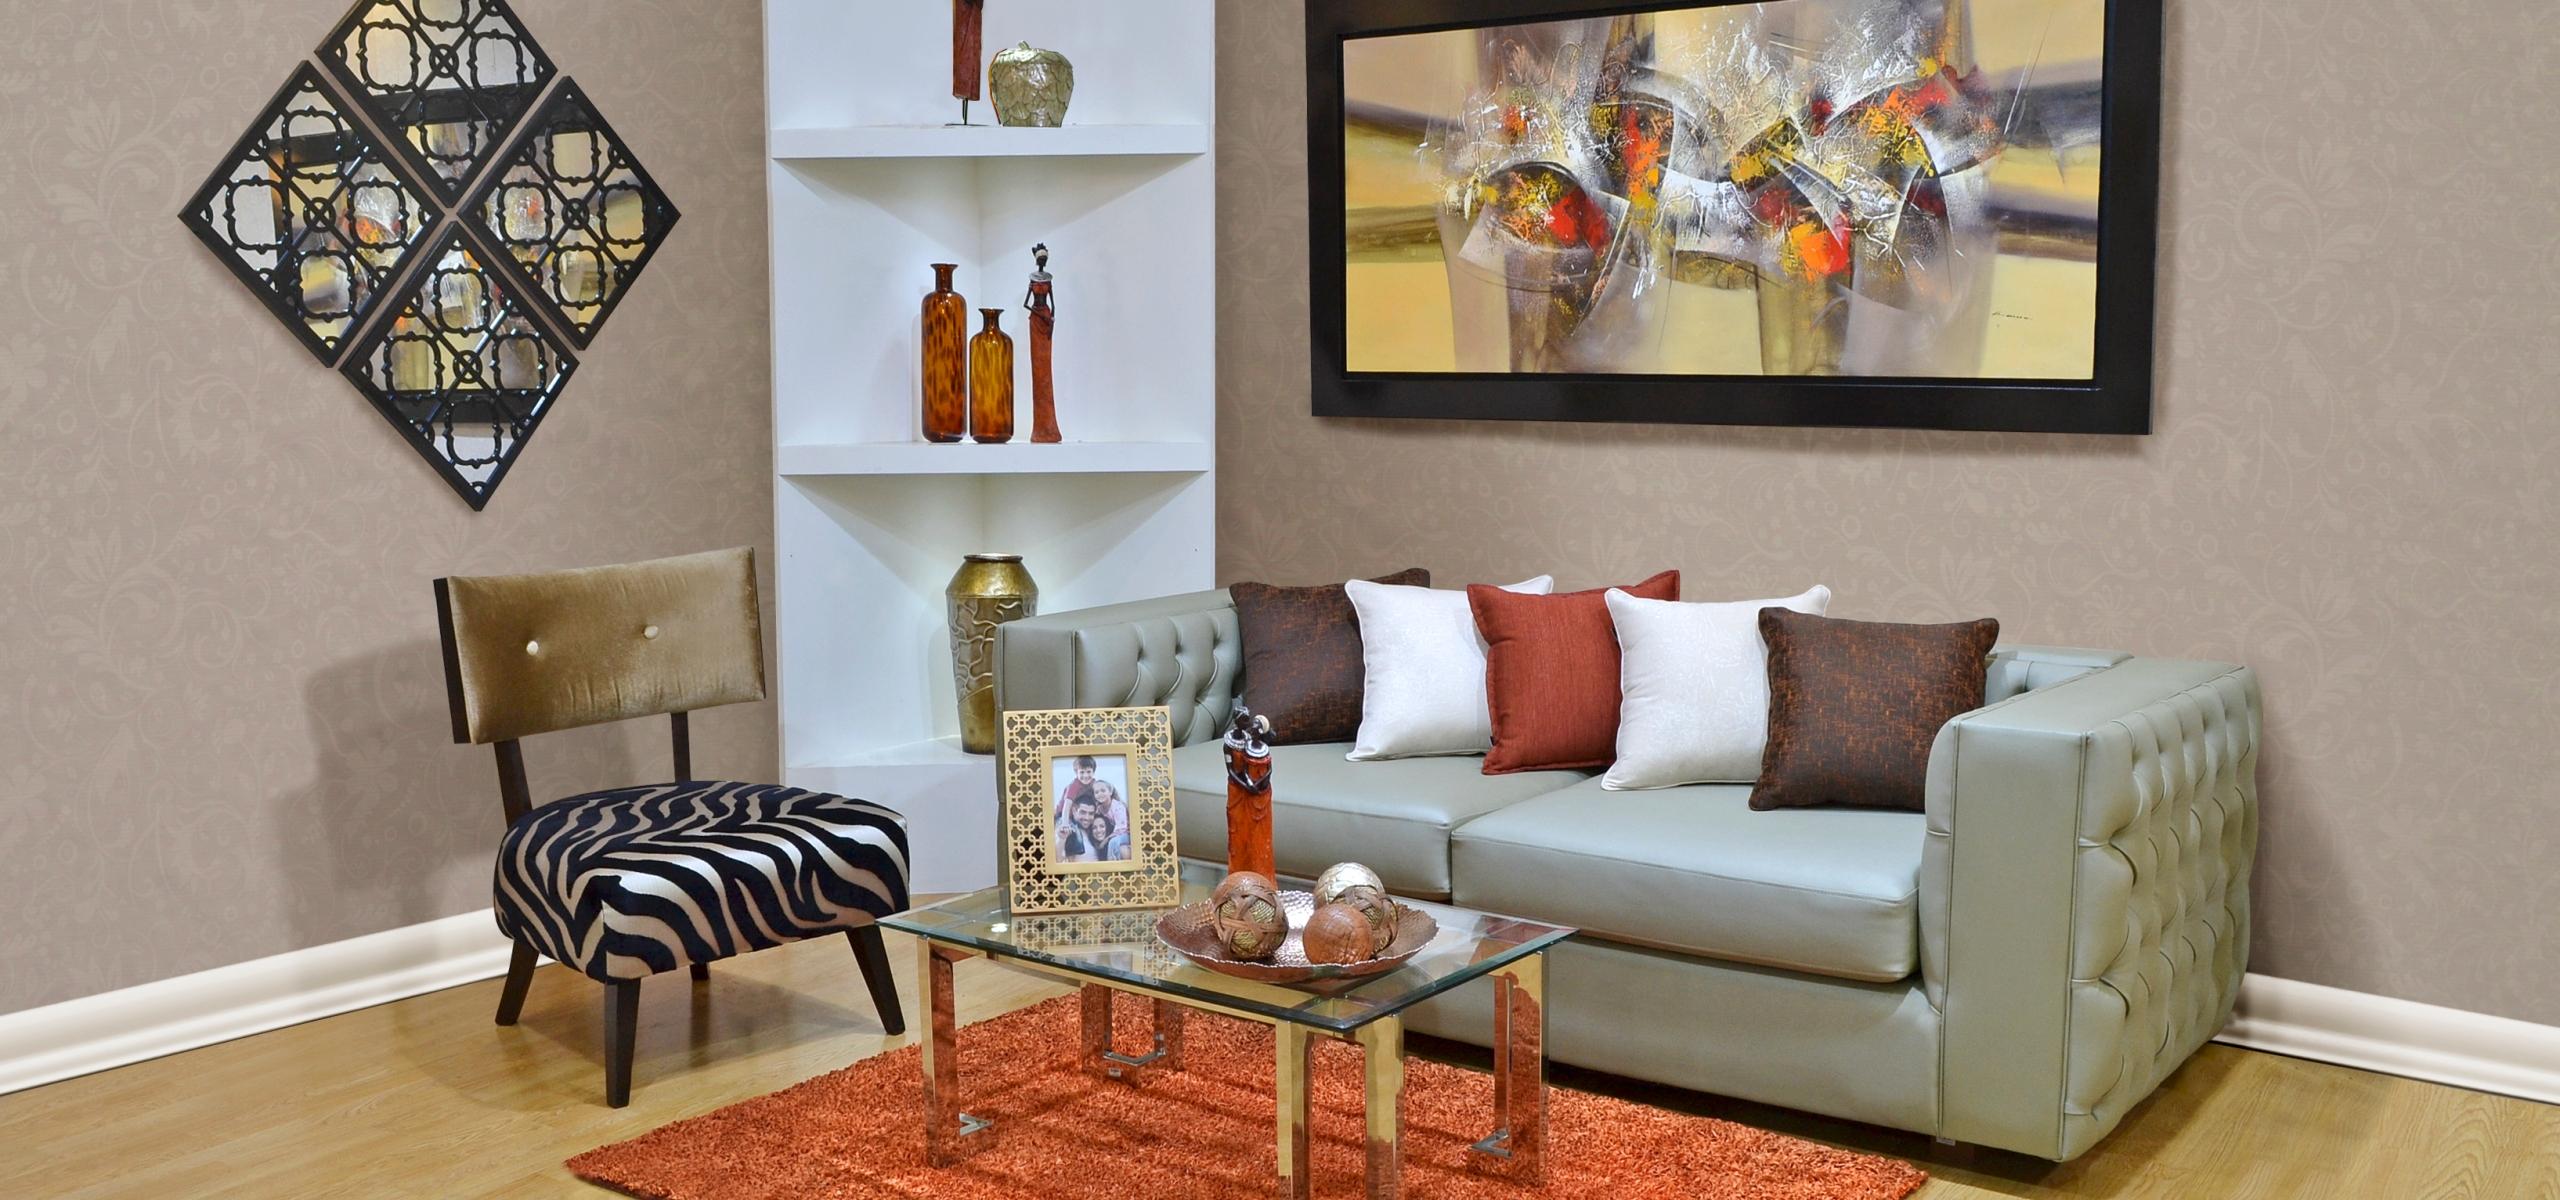 #965635  con Butacas: La pieza Ideal para tu Sala y Recibidor. Panorama Hogar 2560x1200 píxeis em Cuadros Modernos Para Sala De Estar